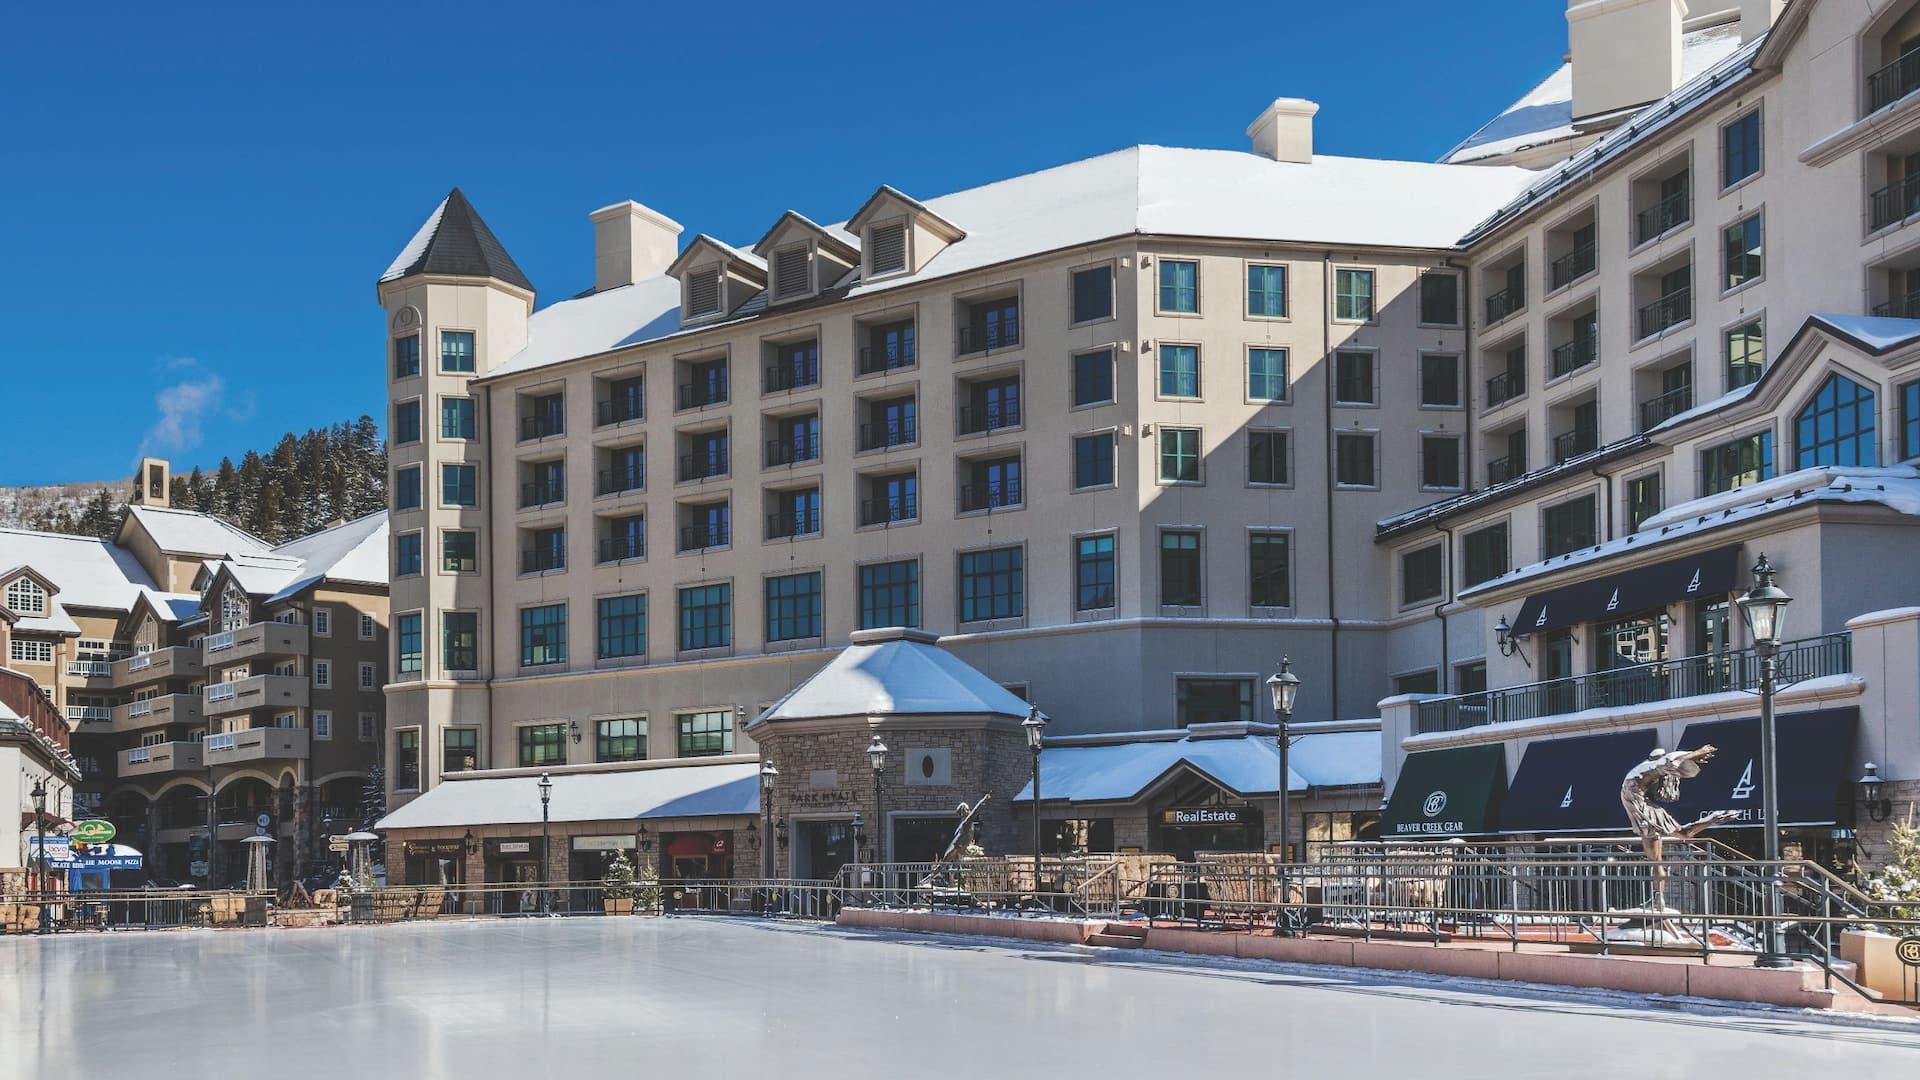 Beaver creek hotel exterior